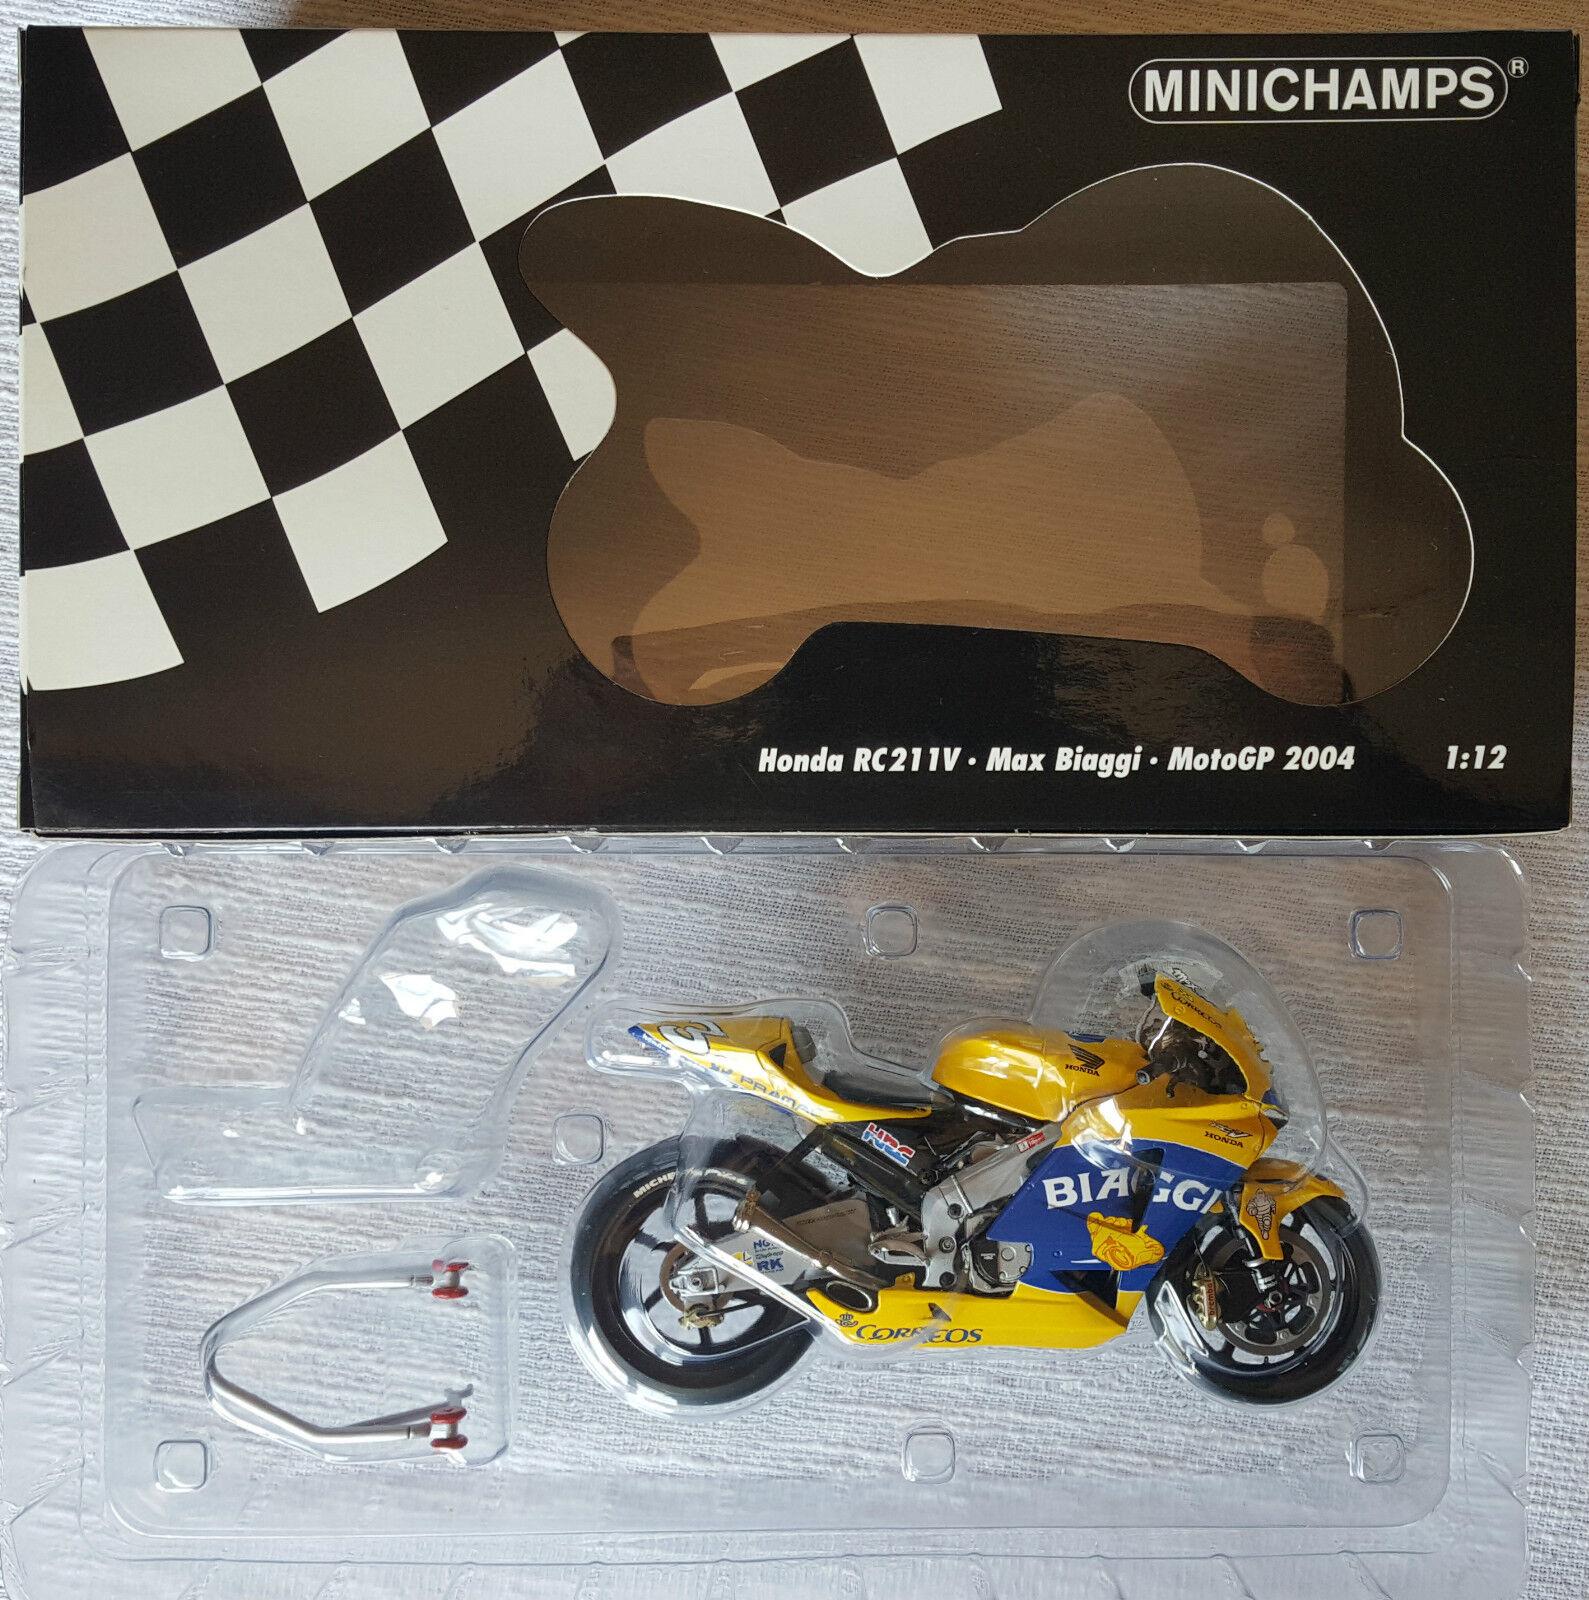 MINICHAMPS 1 12 MAX BIAGGI HONDA RC211V CAMEL PRAMAC PONS MOTOGP 2004 RARE